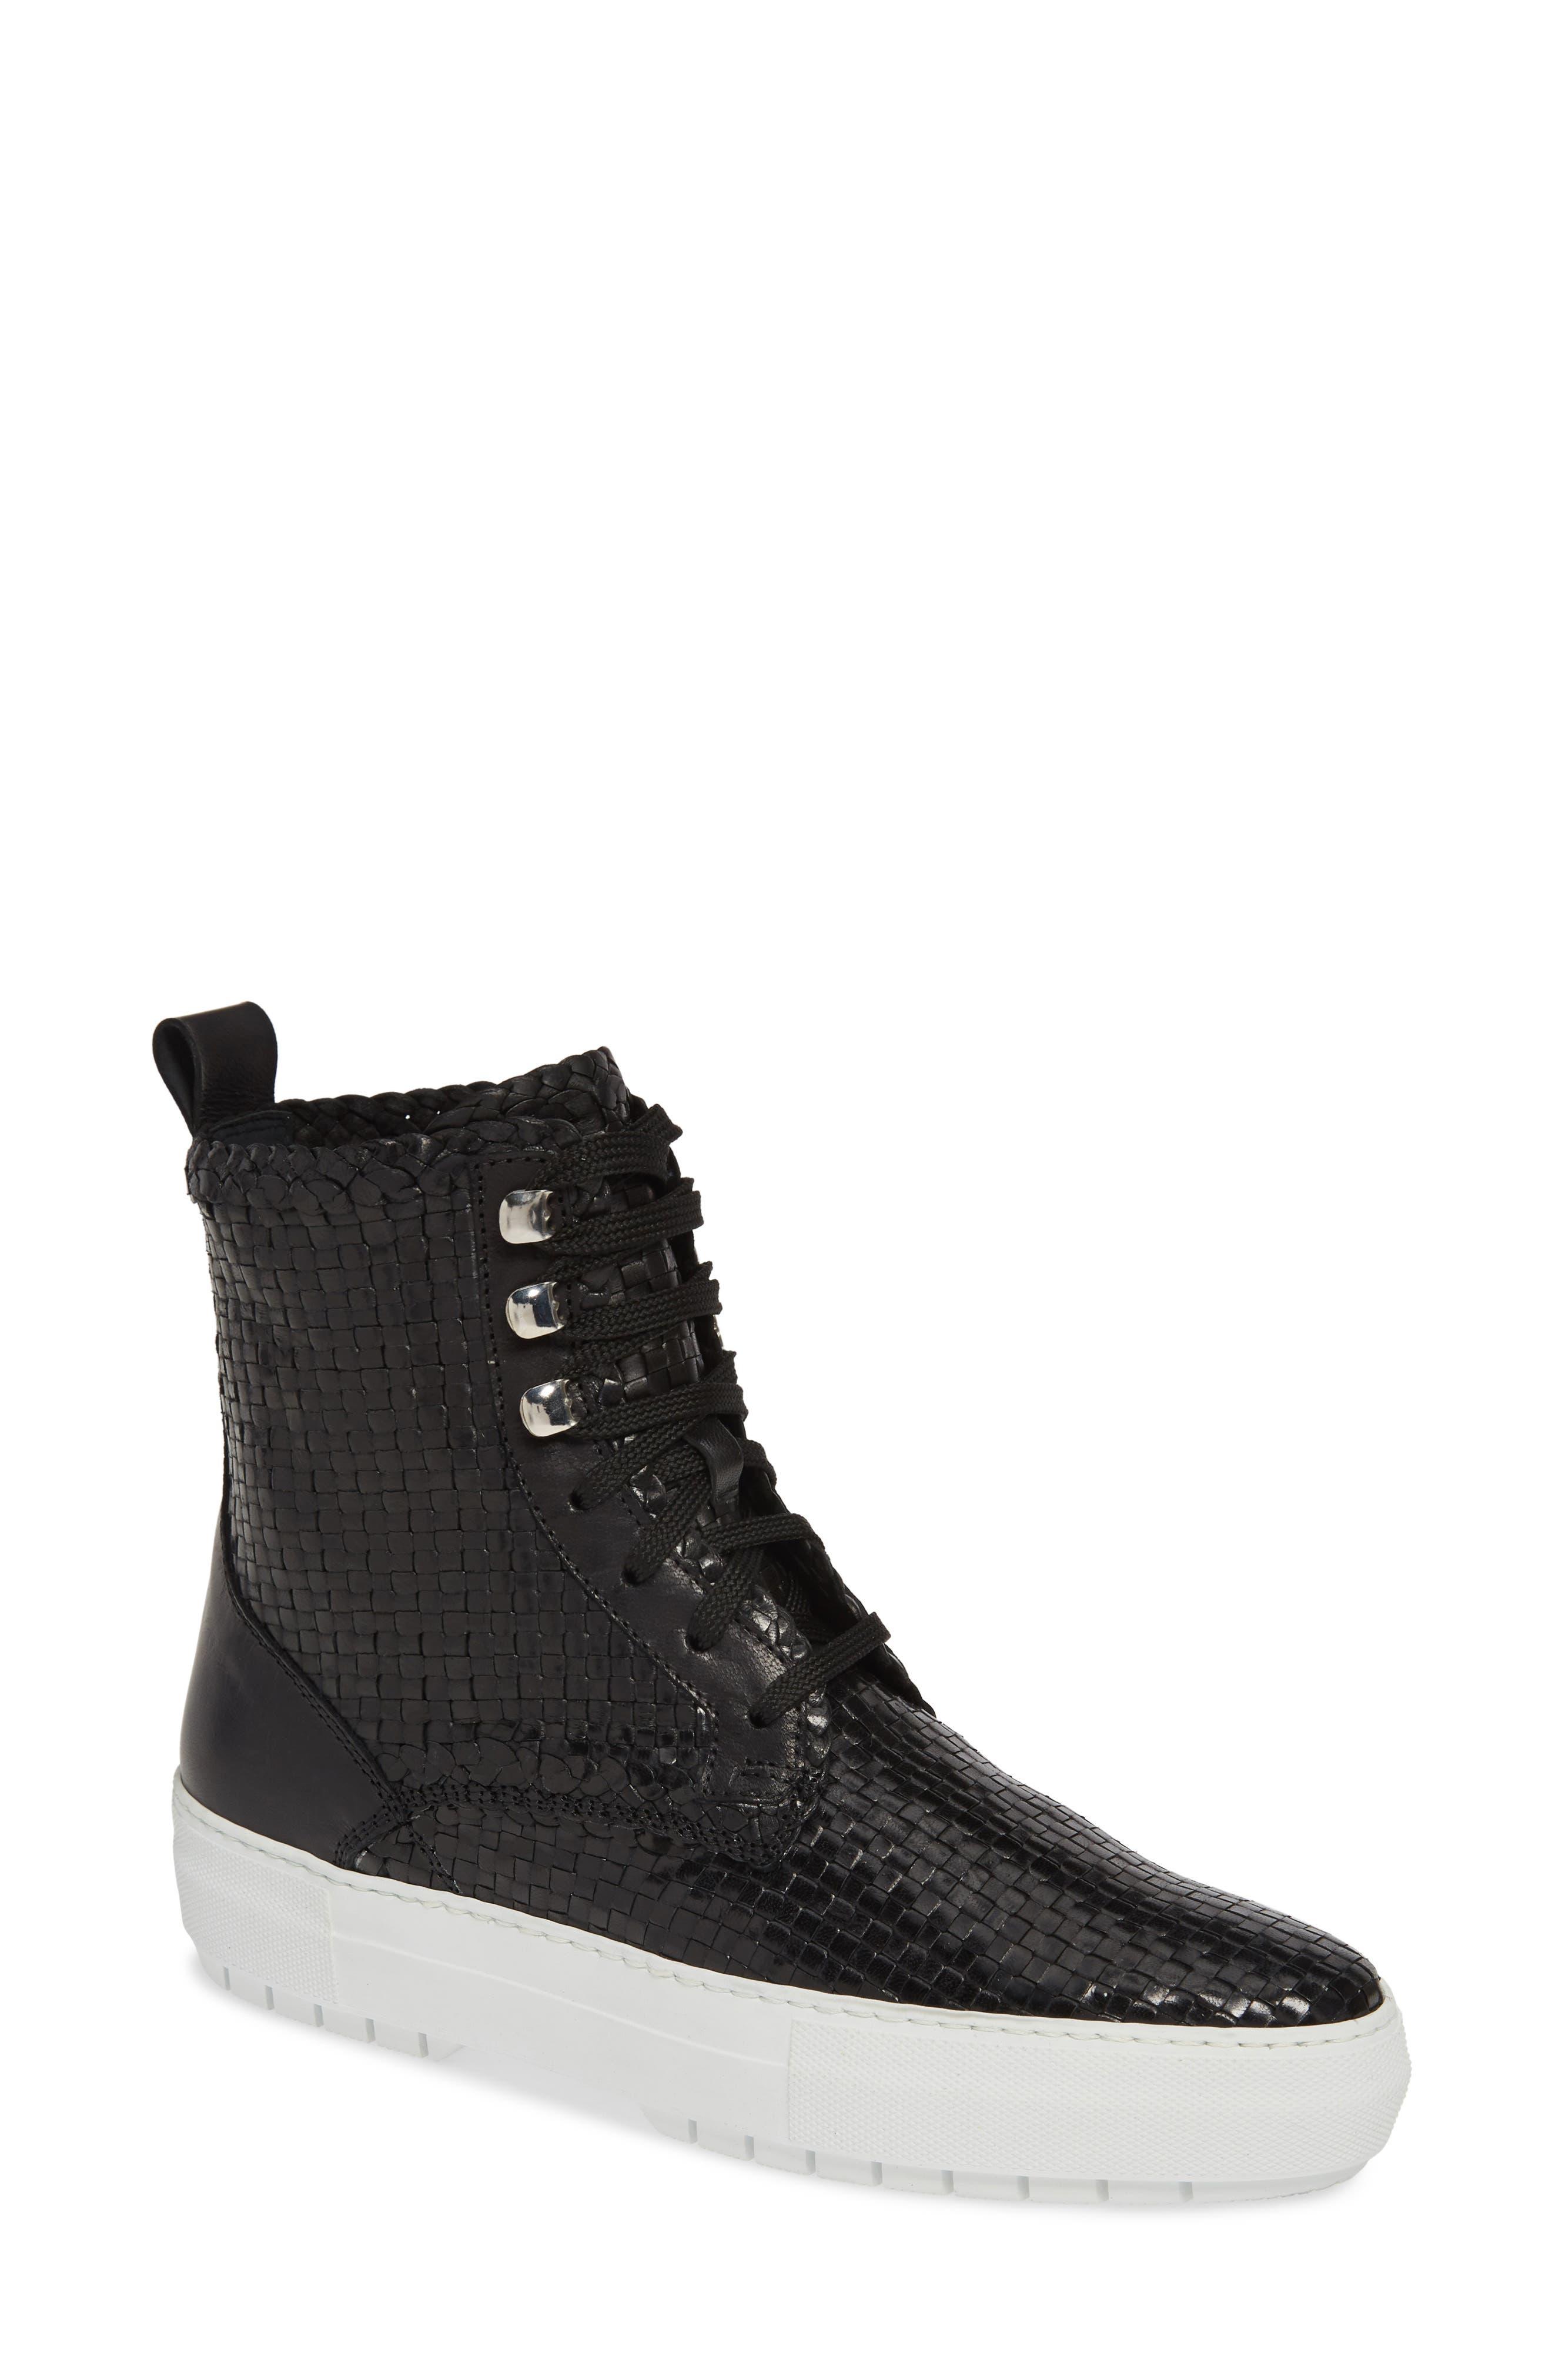 Aquatalia Tess Woven Boot- Black